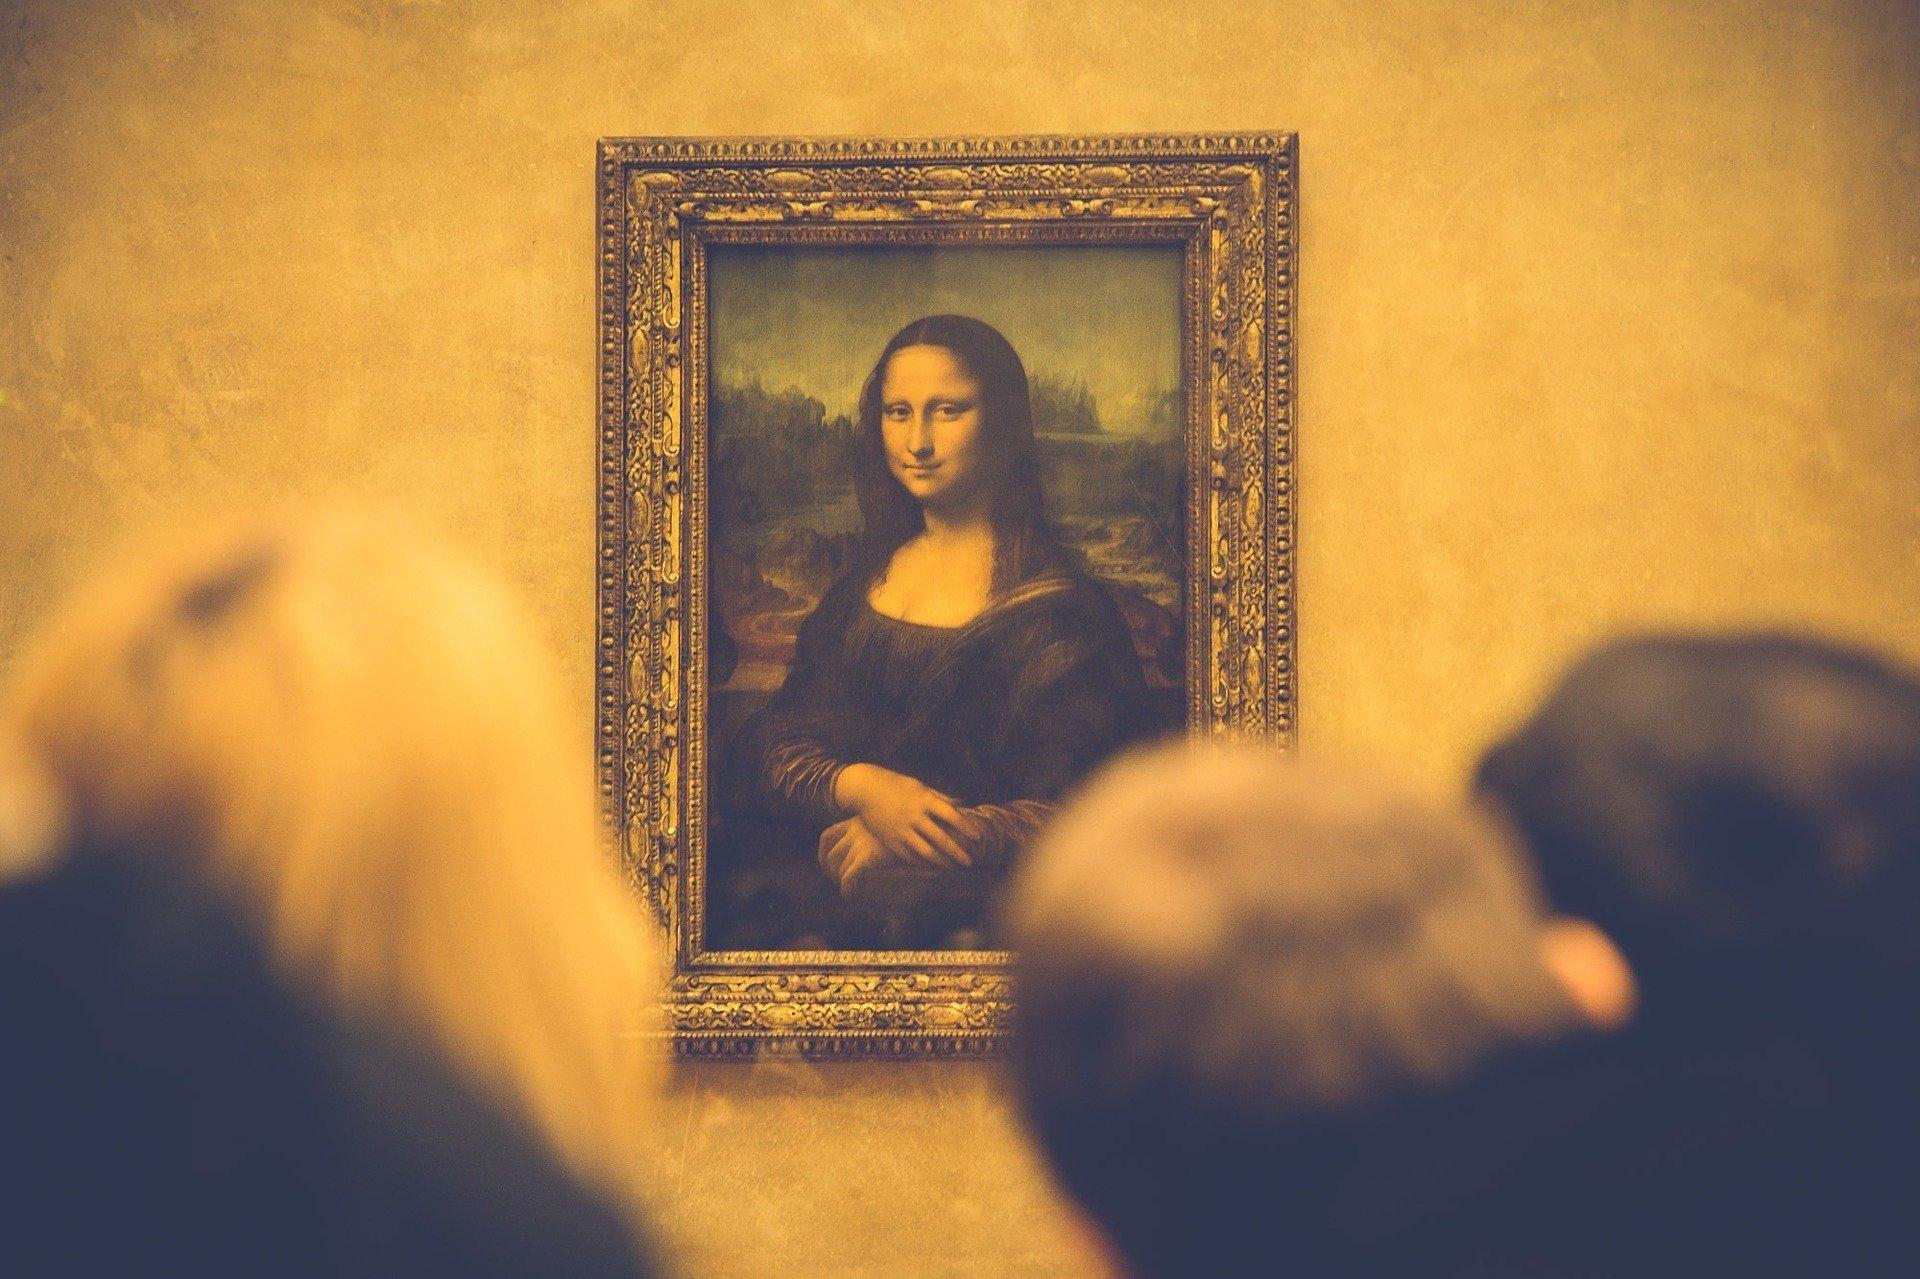 Mona Lisa Museo del Louvre